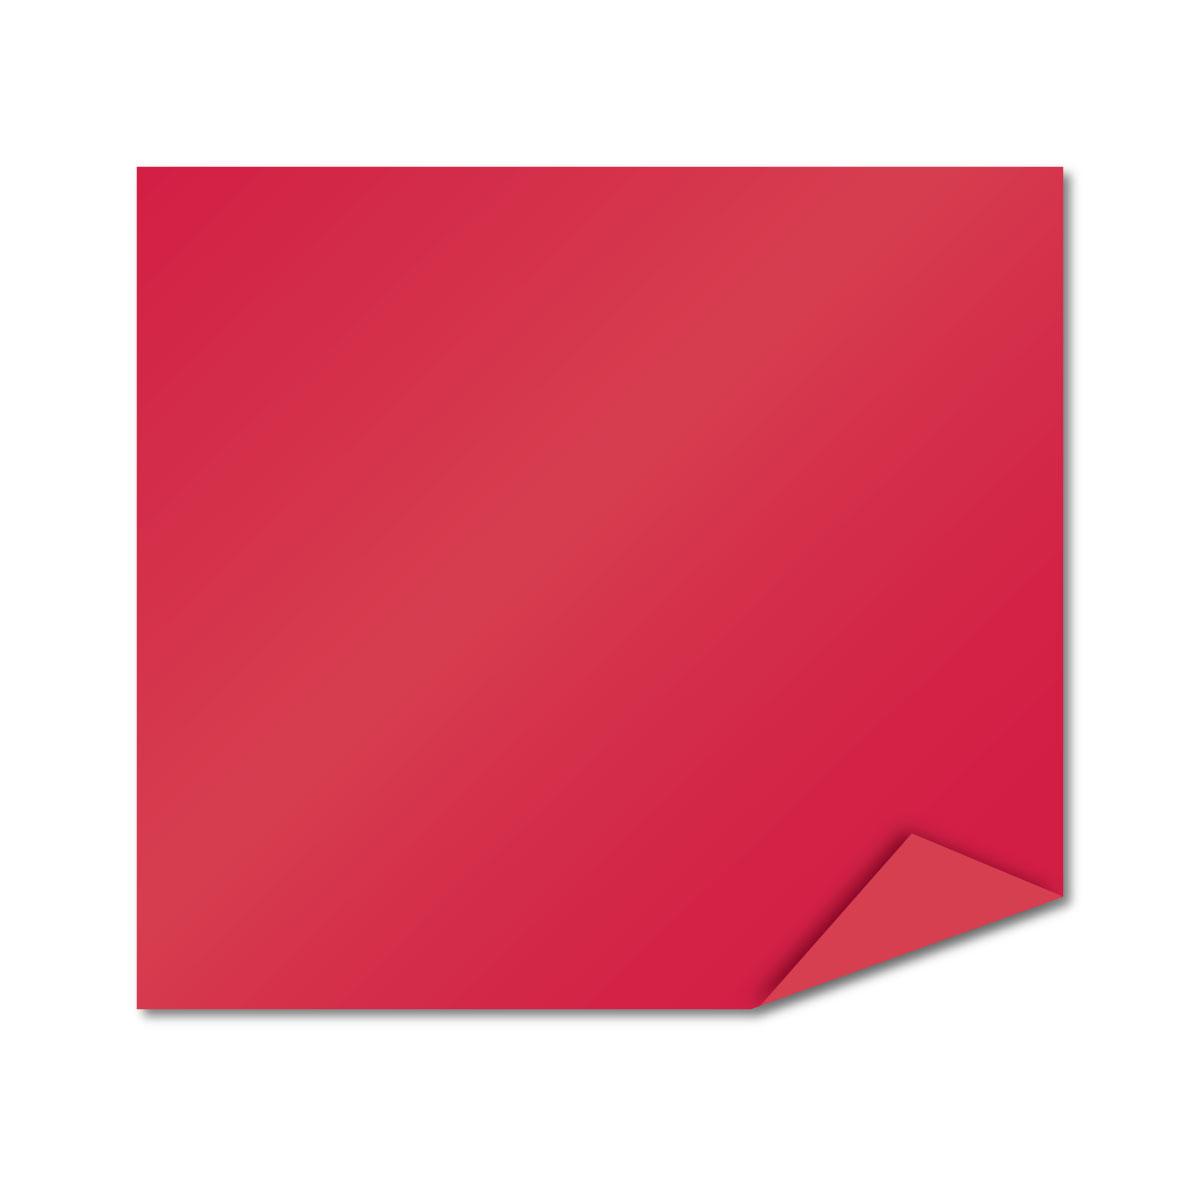 pvb 038mm vanceva deep red interleaved 2460mm